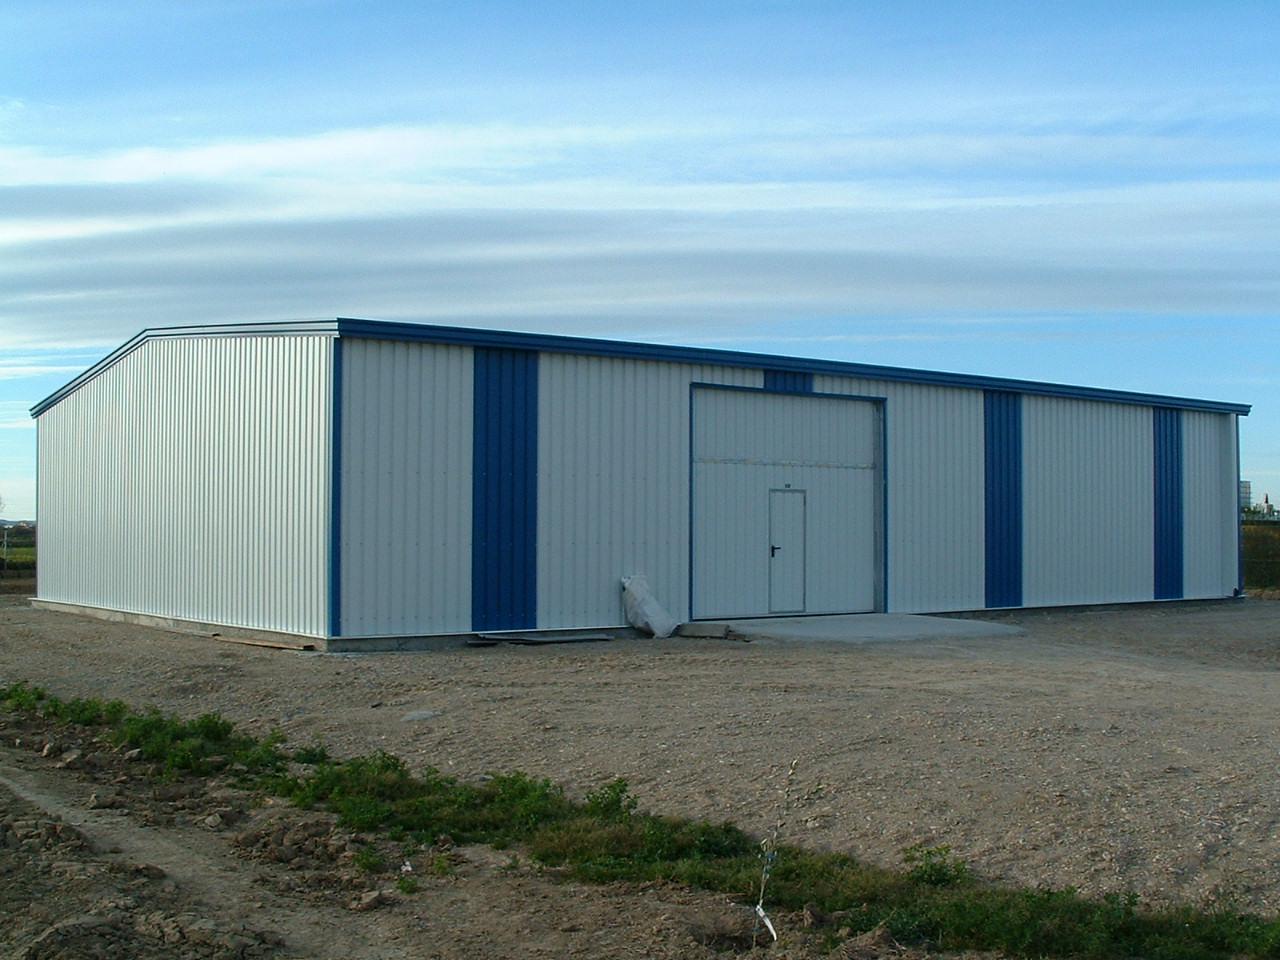 Nave almacén agrícola ECORAPID. Estructura metálica modular de acero y fachadas en chapa